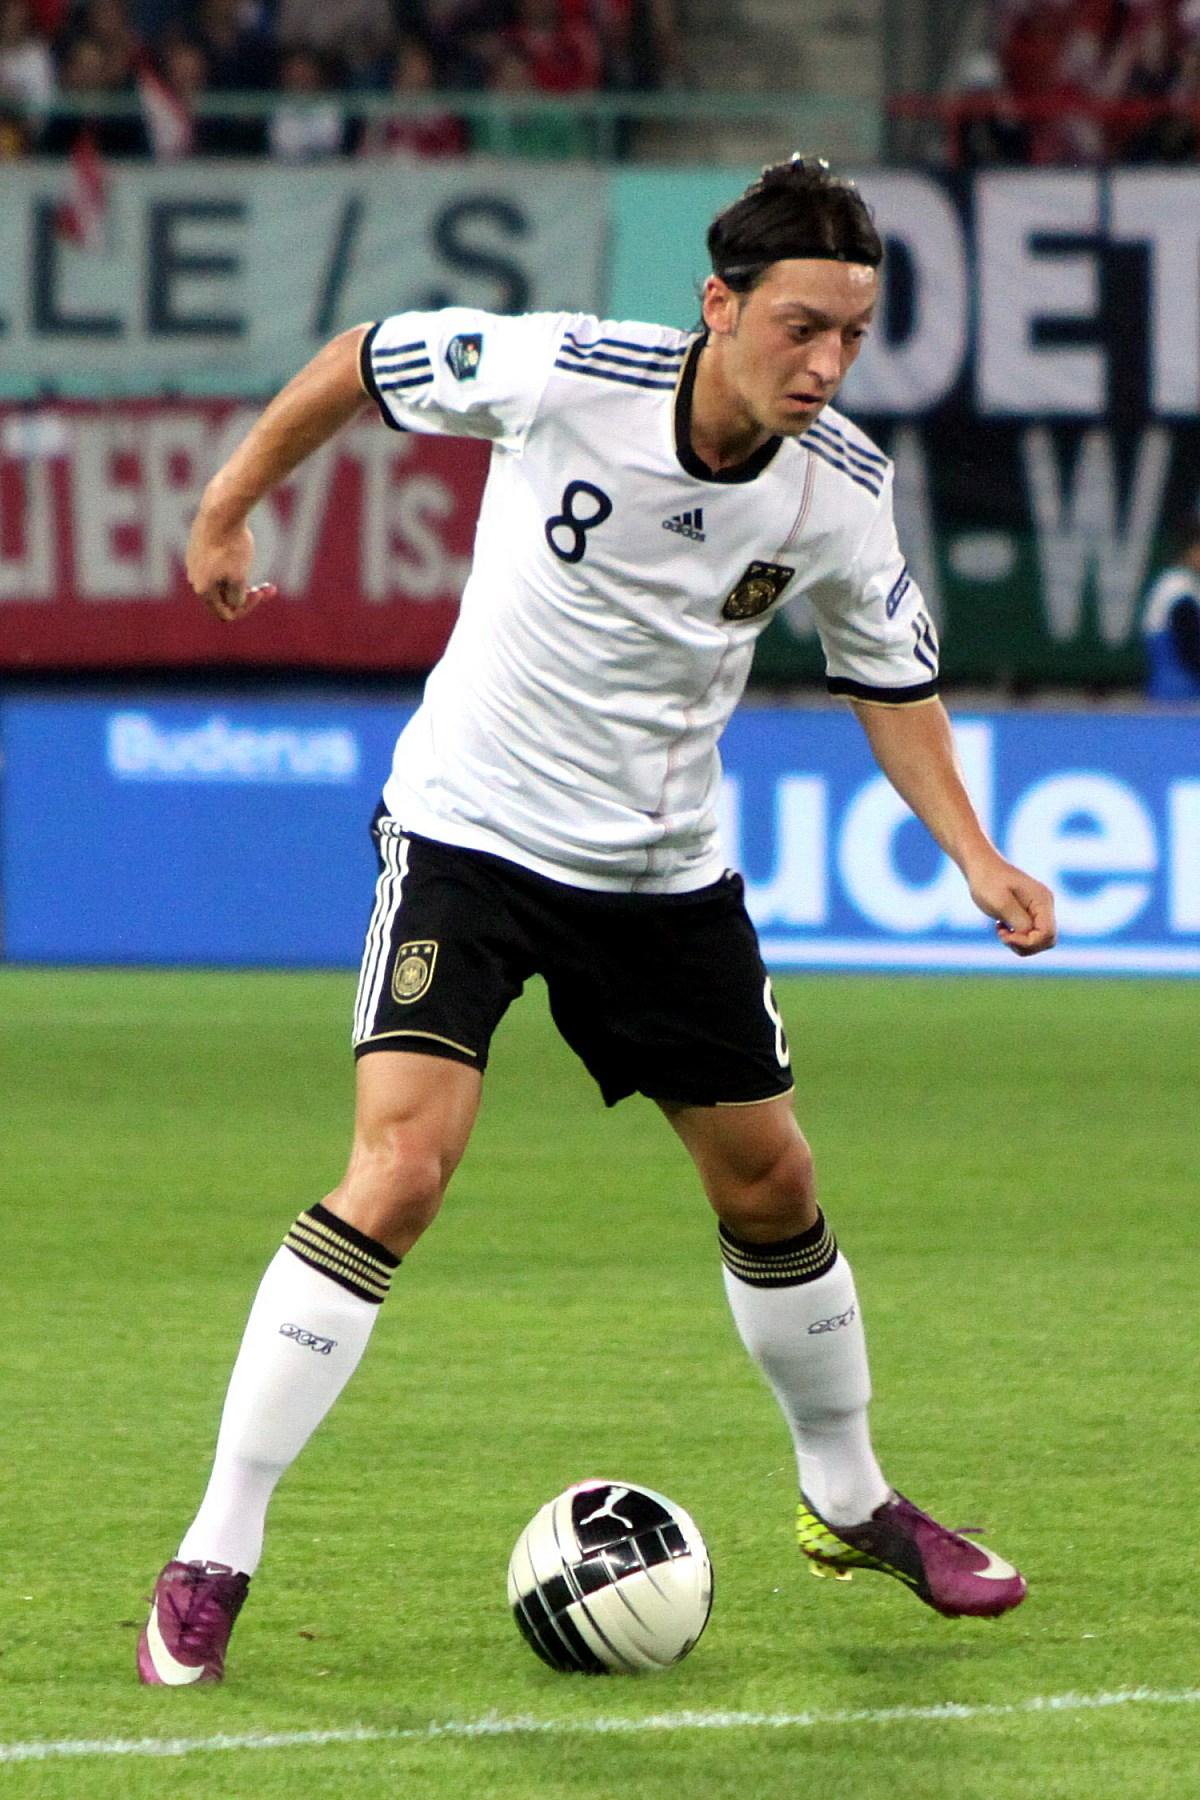 Mesut_Özil,_Germany_national_football_team_(04)